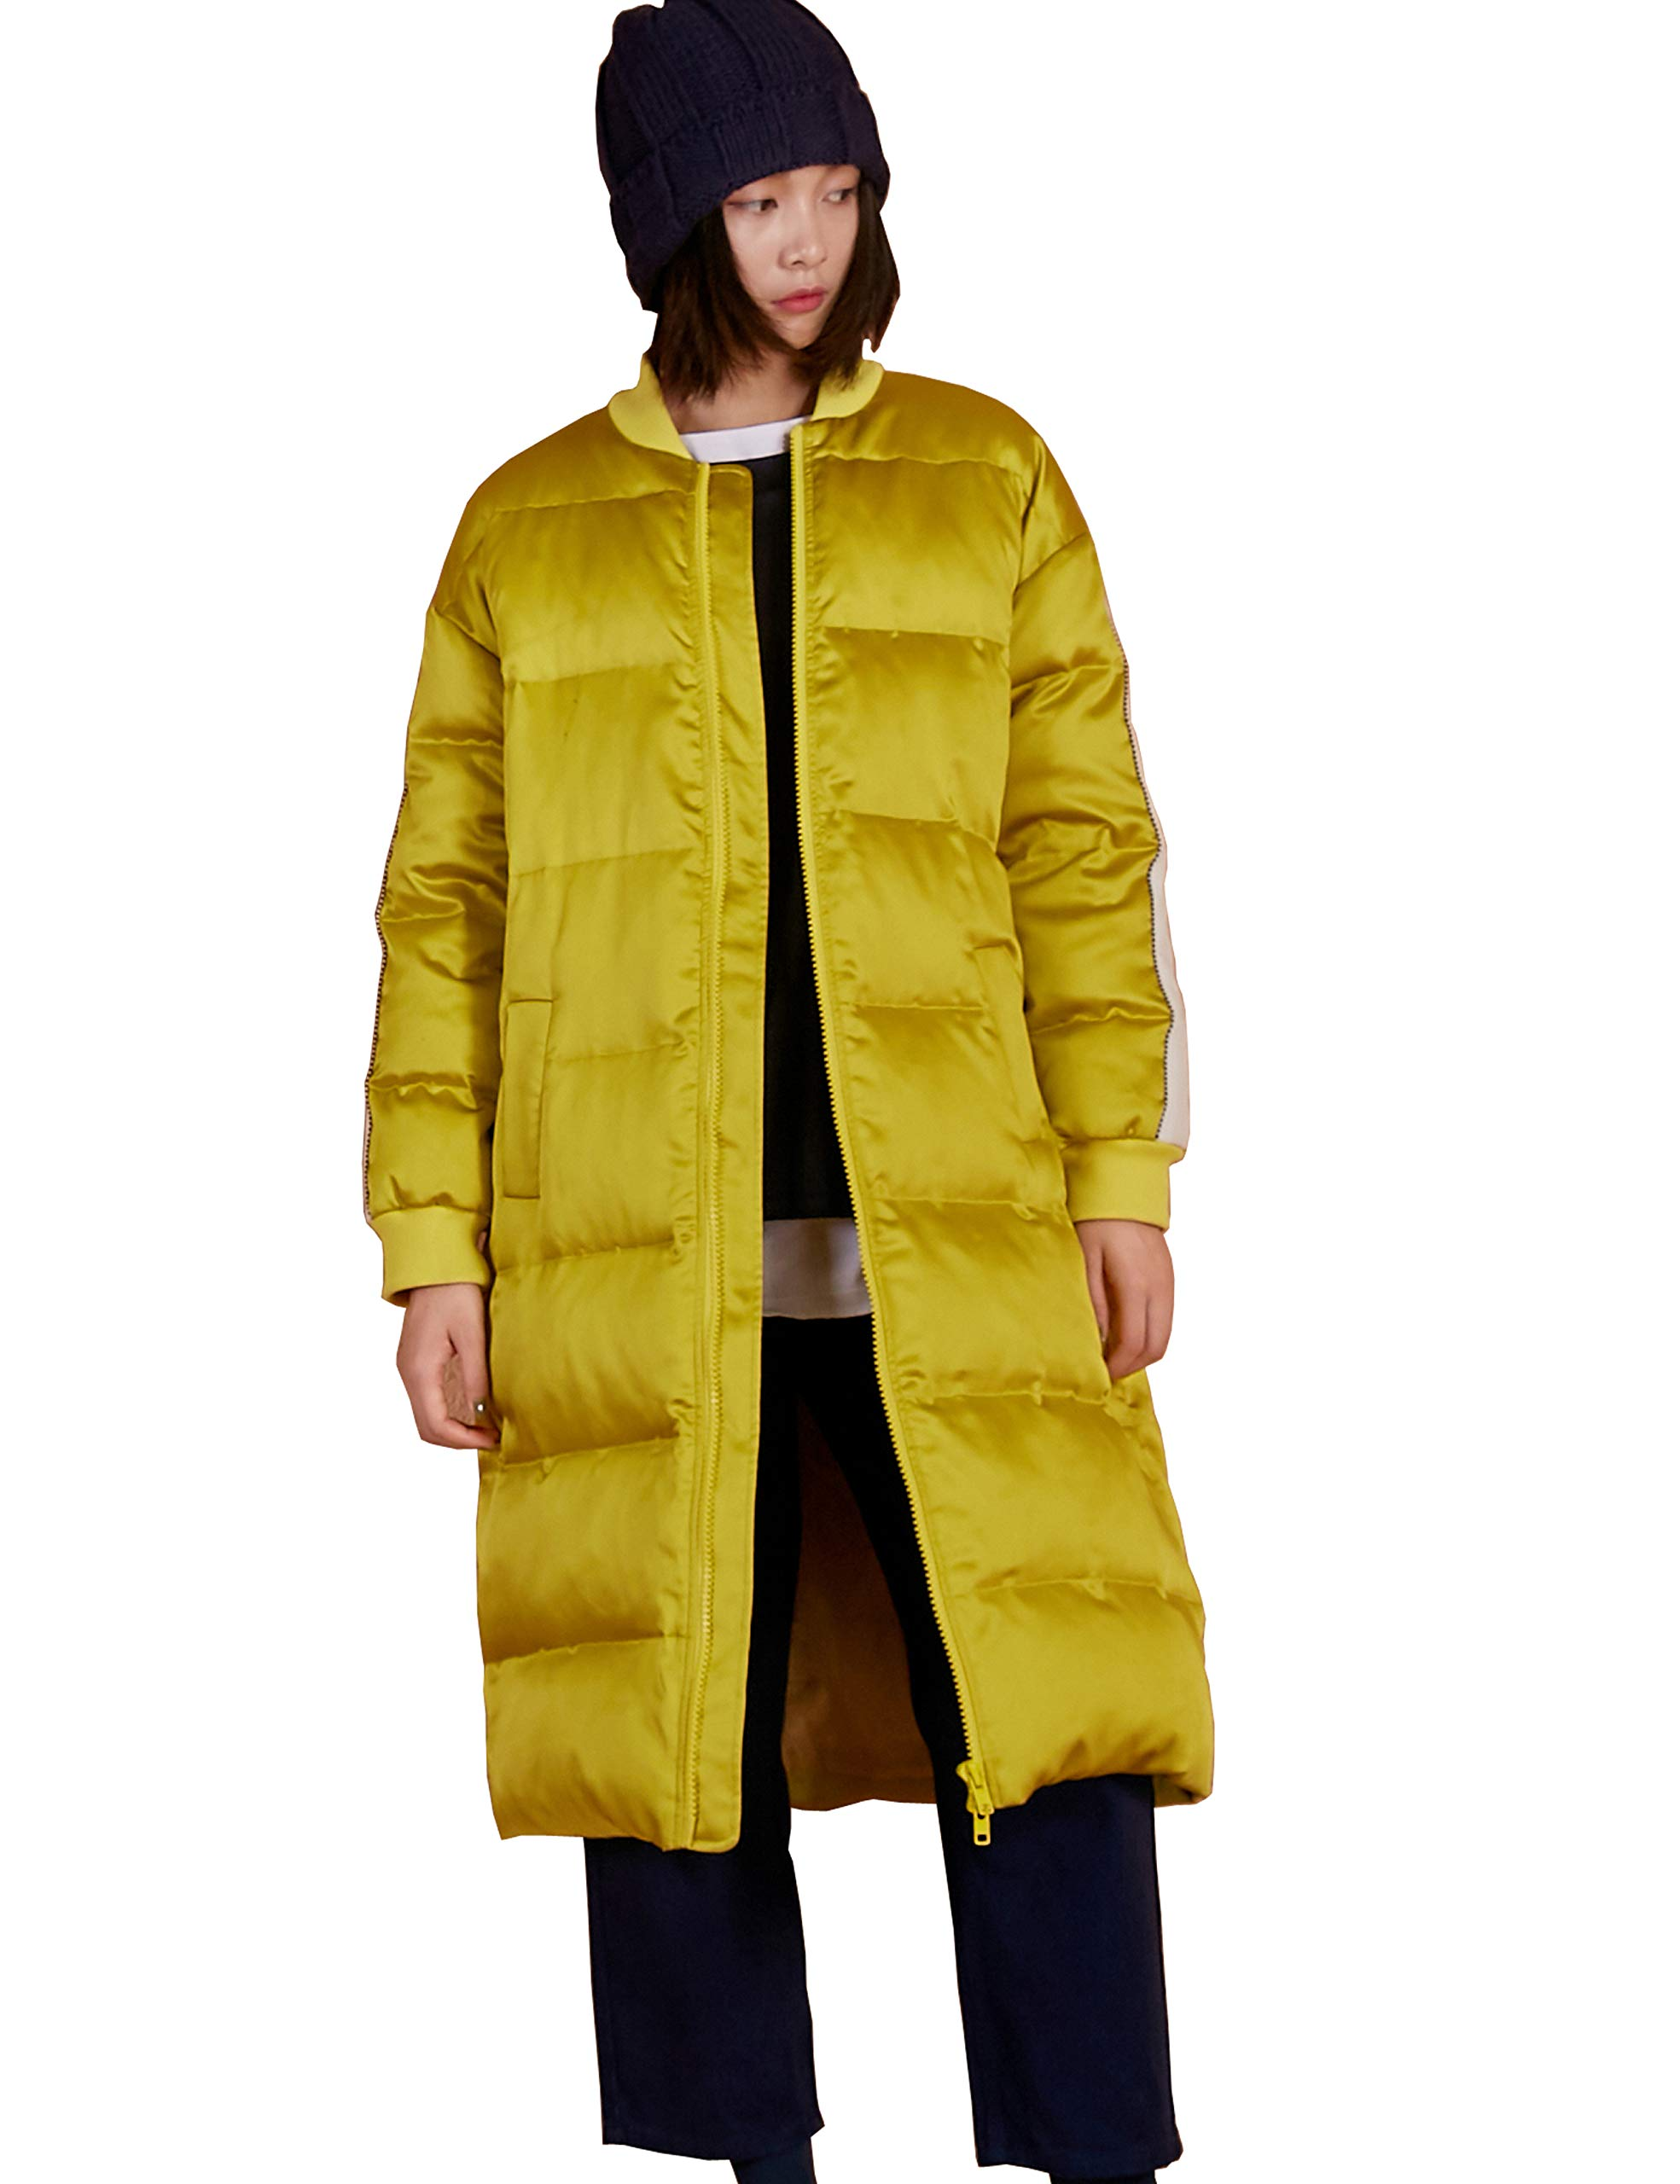 Elf Sack Women Thickened Long Down Parkar, Baseball Style Puffer Down Jacket Winter Outwear Coat